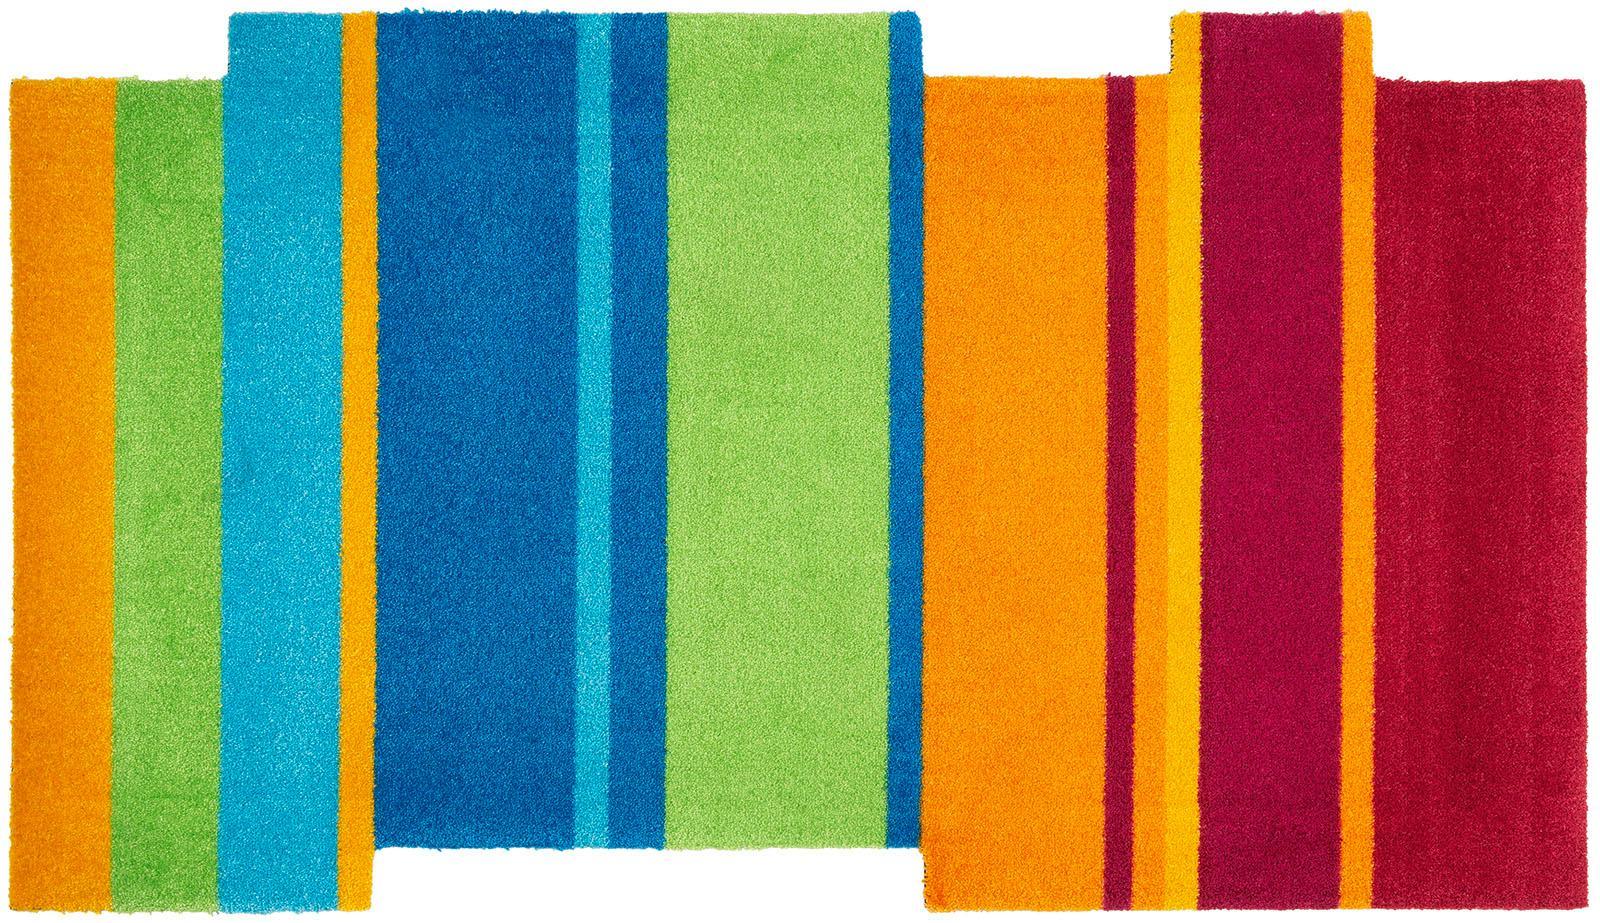 Teppich Dancing Steps wash+dry by Kleen-Tex stufenförmig Höhe 9 mm gedruckt